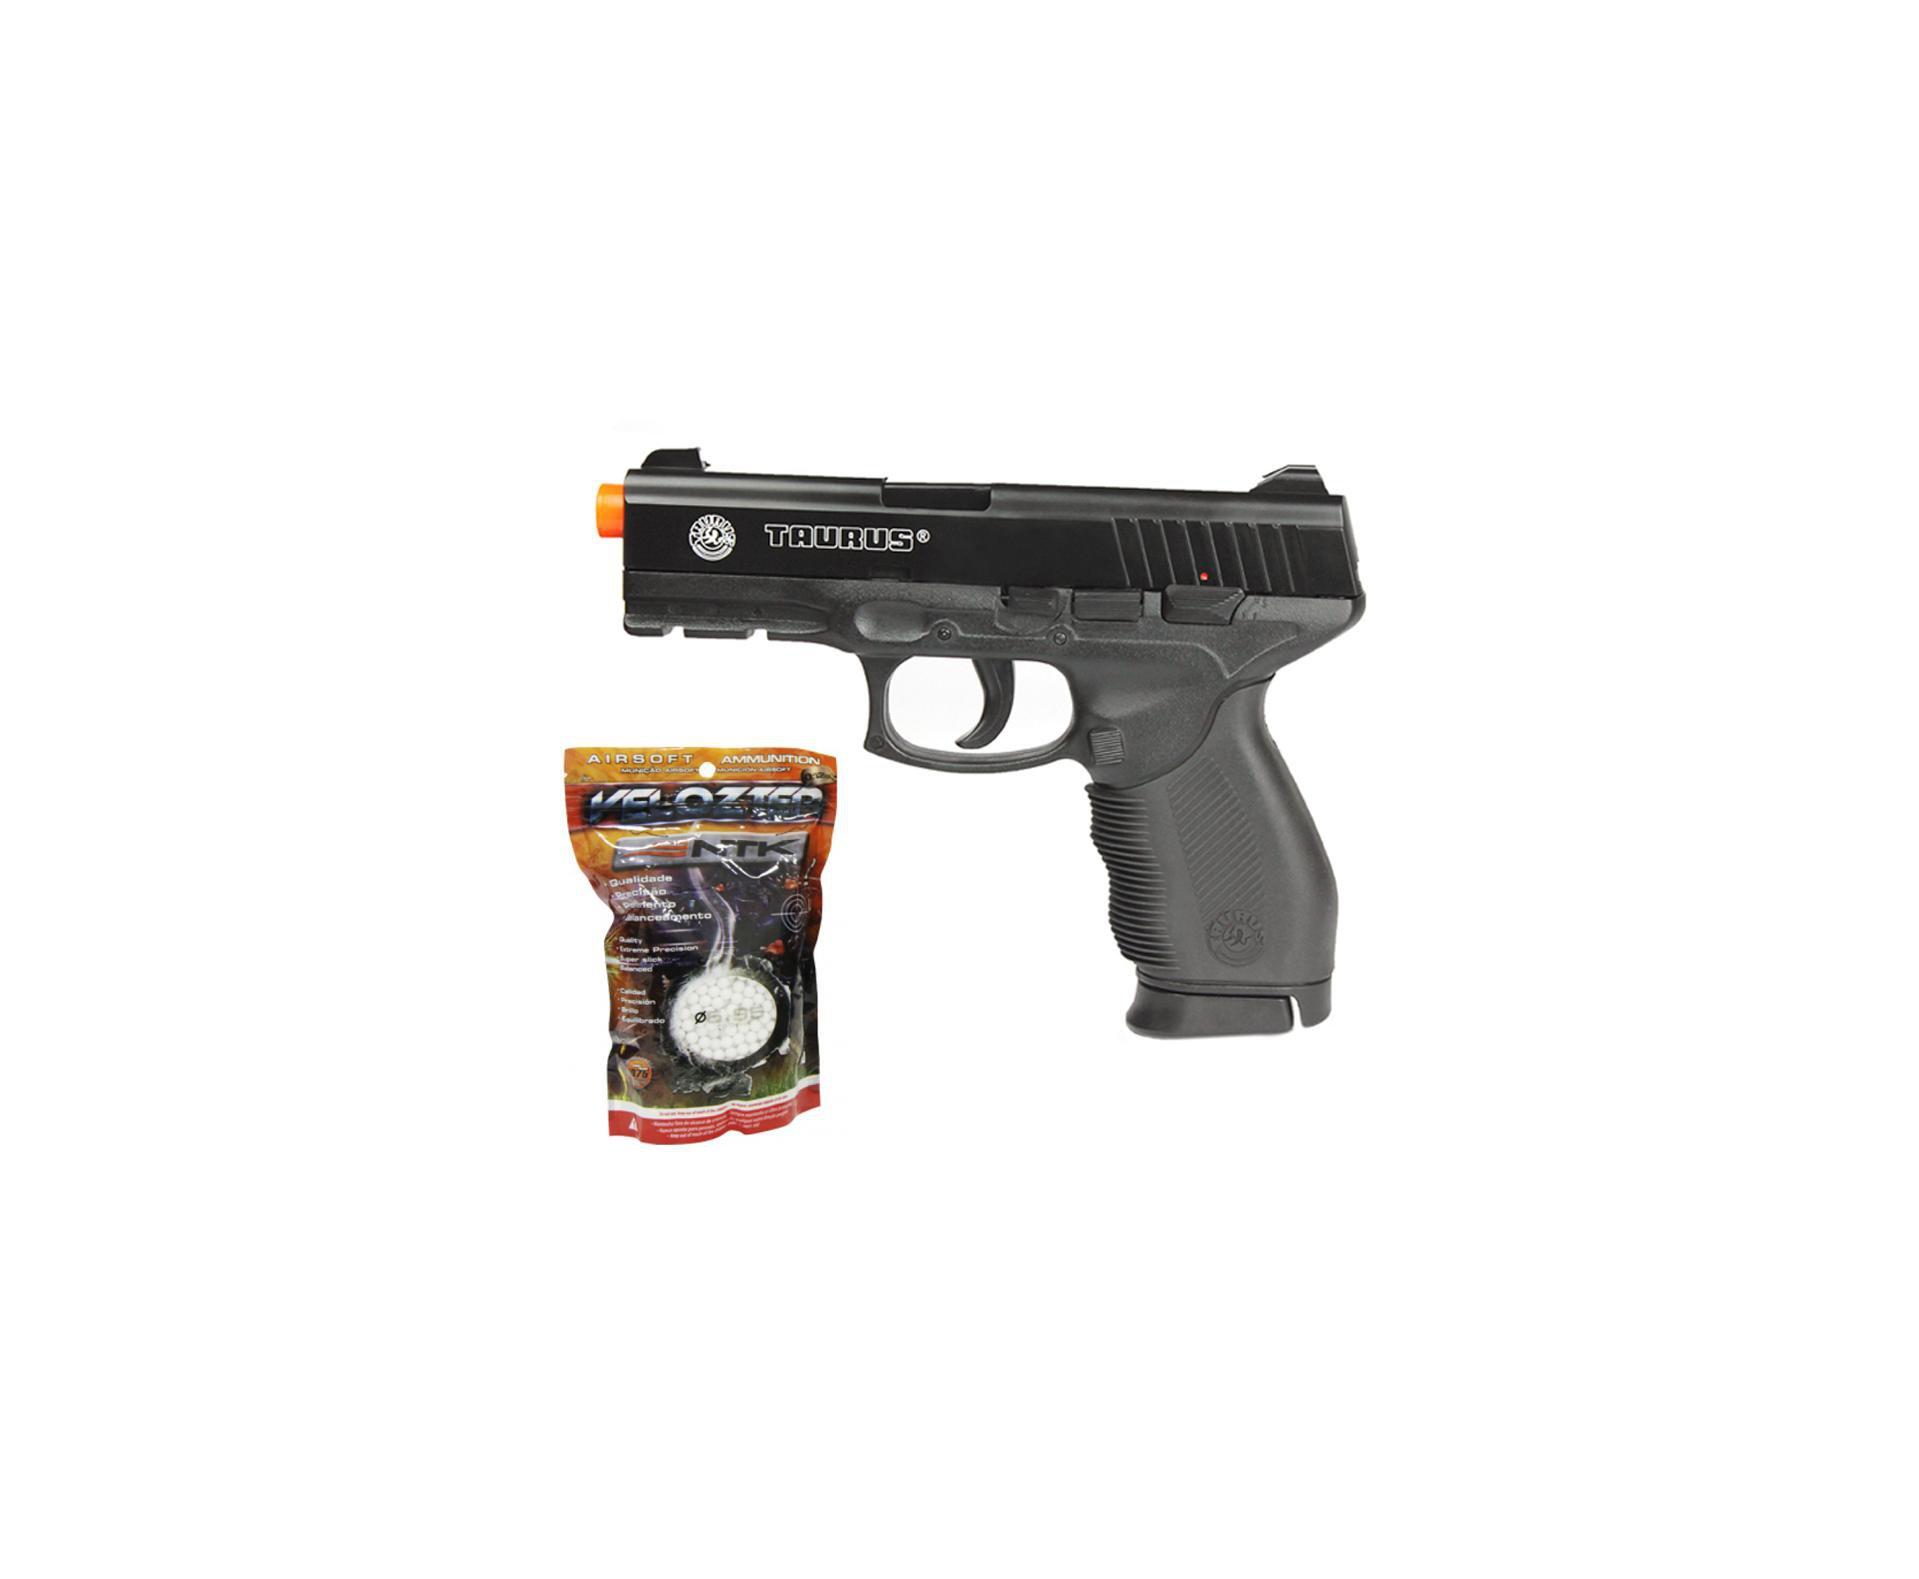 Pistola De Airsoft Taurus Pt 24/7 Semi/metal Cal 6,0 Mm + 2000 Esfera 0,12g - Cyber Gun